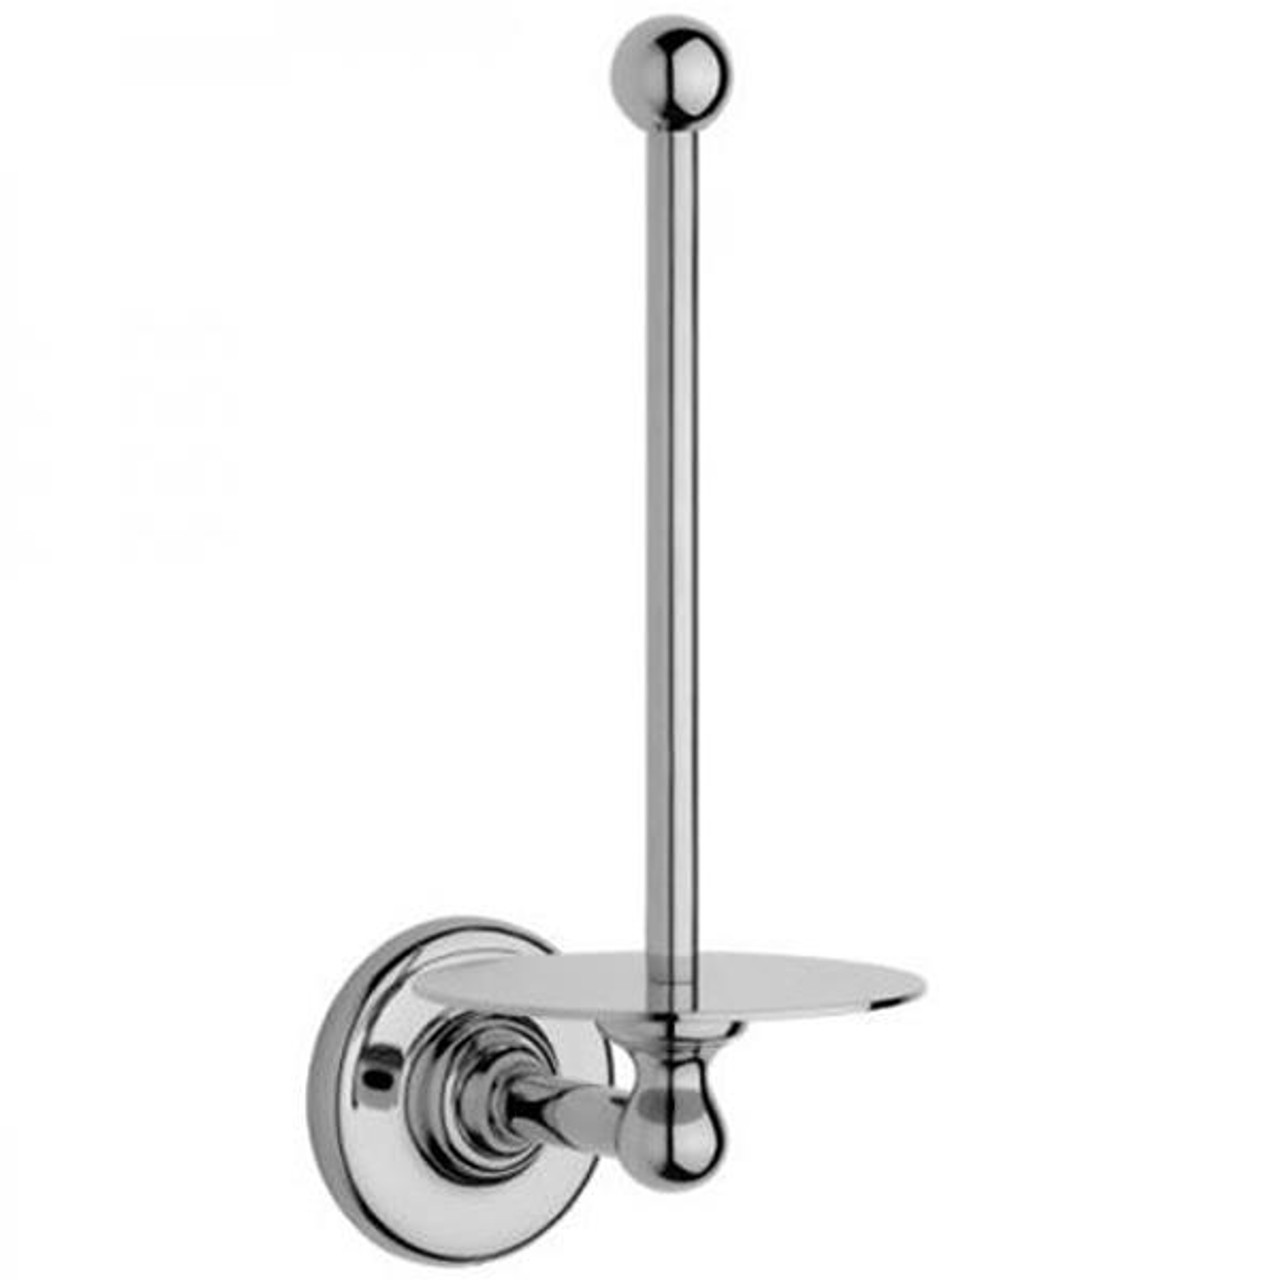 Chrome Plated Samuel Heath Antique Spare Toilet Roll Holder N4331